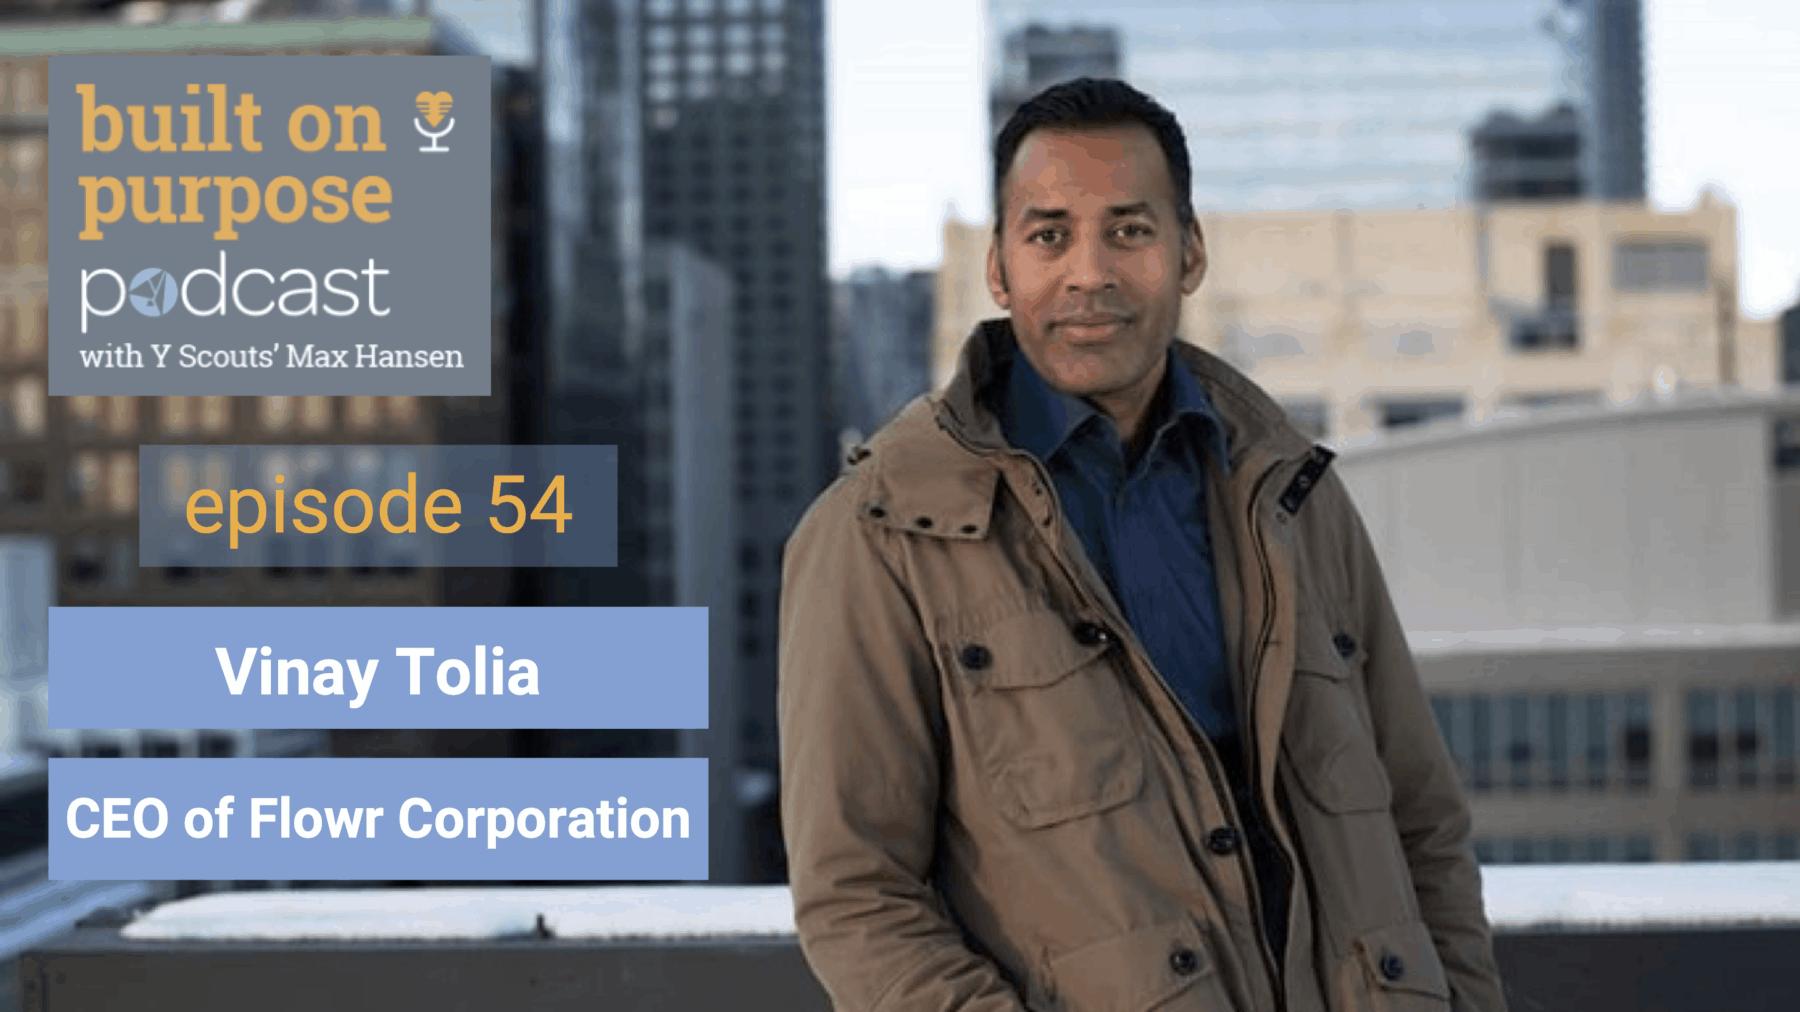 Episode 54 - Vinay Tolia - CEO of Flowr Corporation